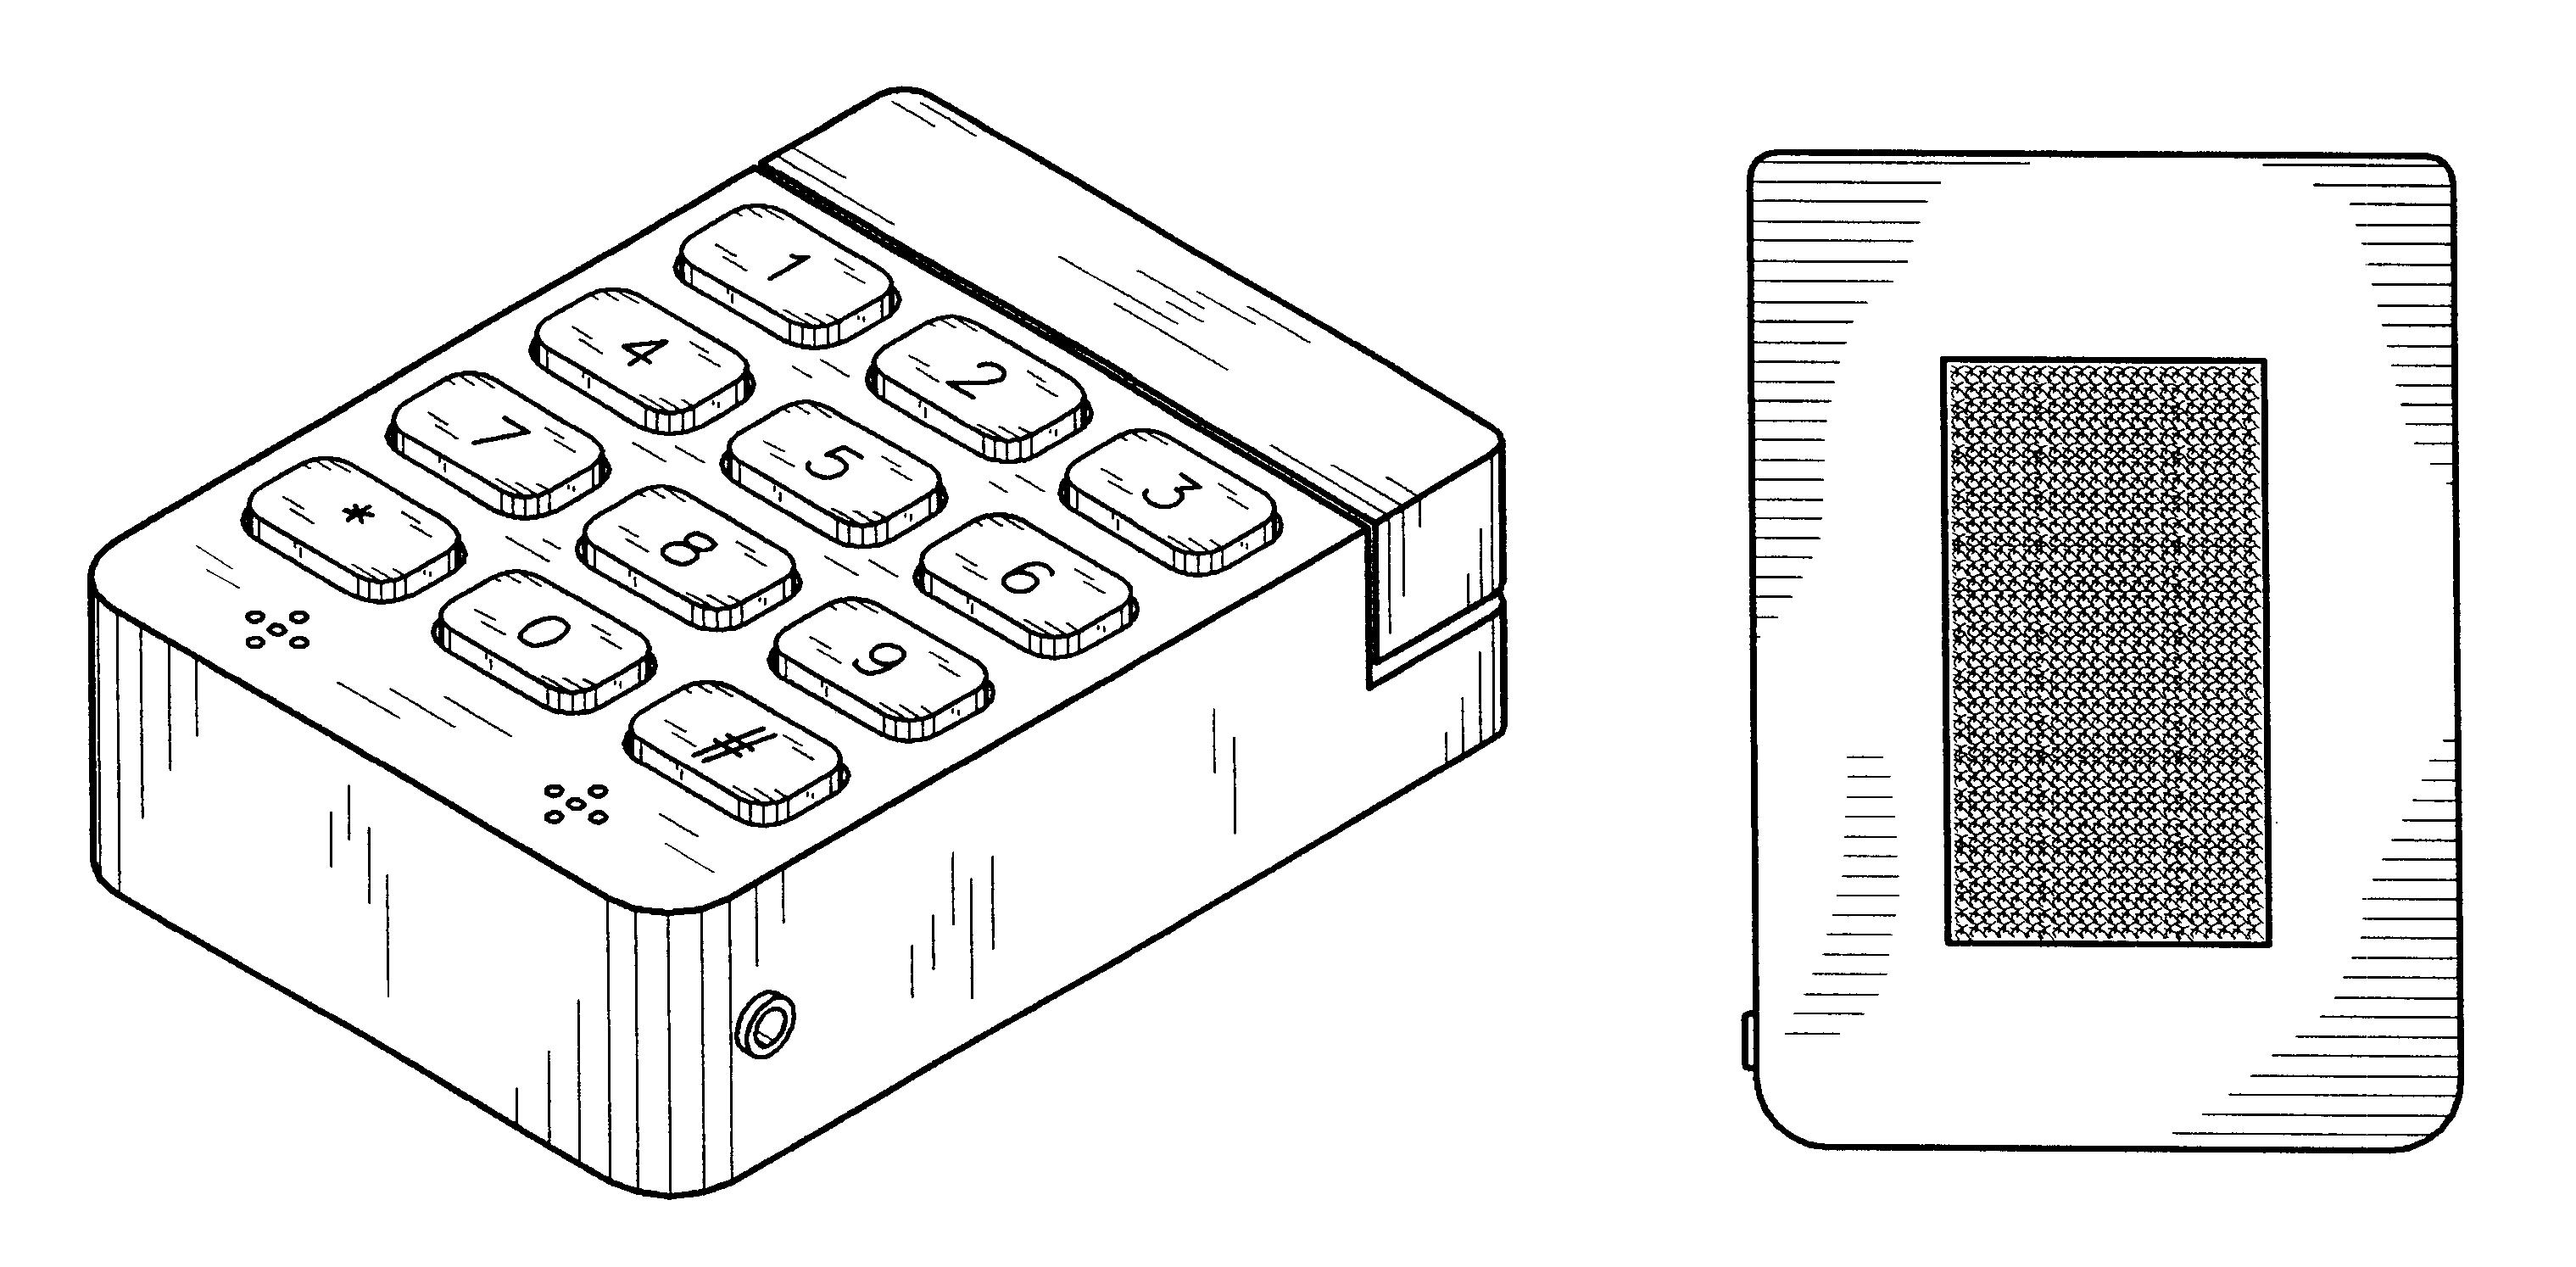 wiringpi keypad mobile